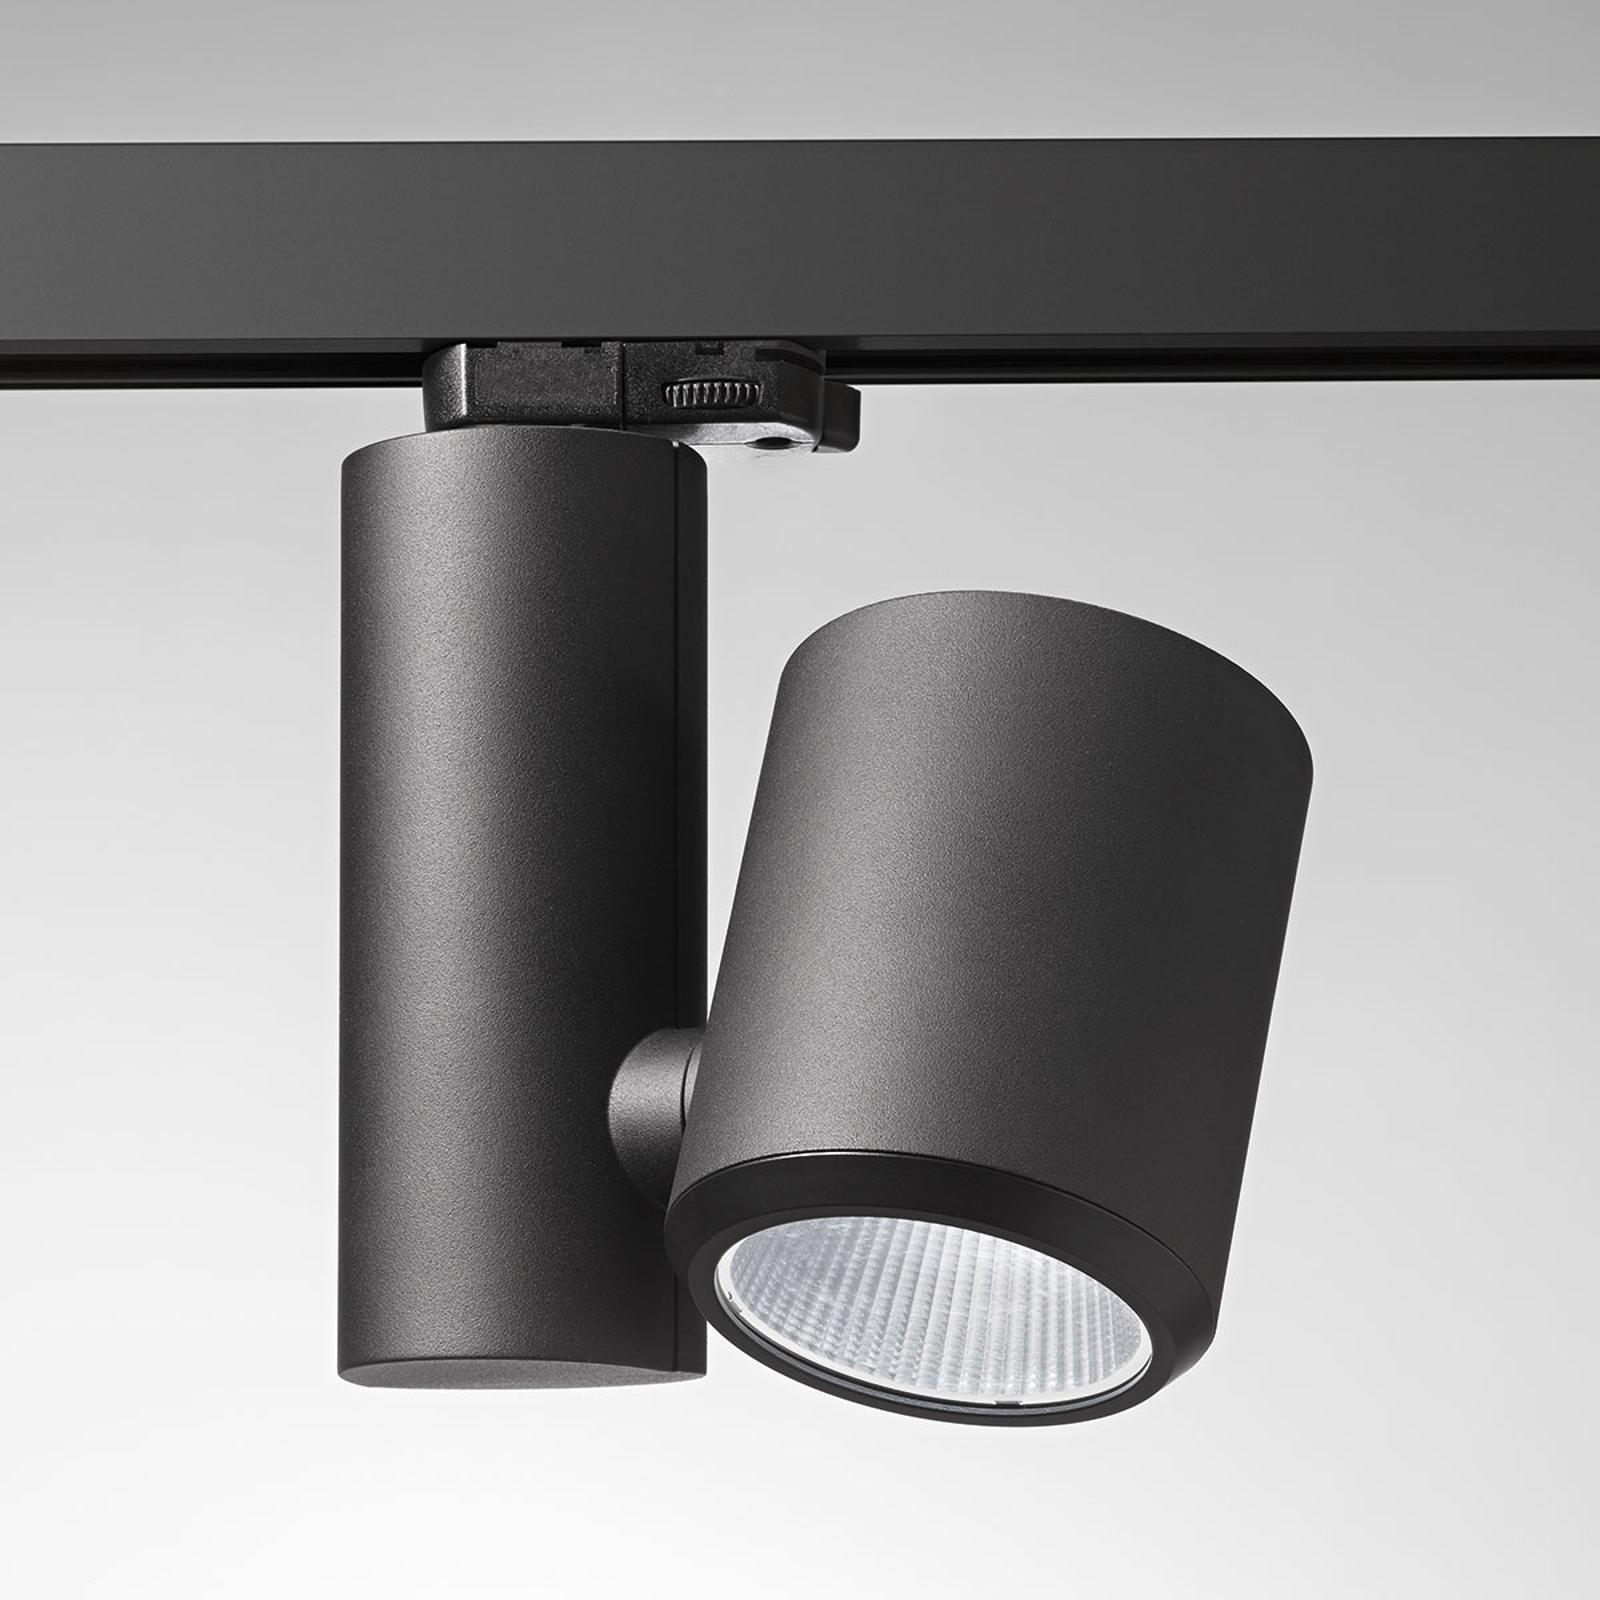 Egger Licht Čierne koľajnicové LED svetlo Kent Meat 15°